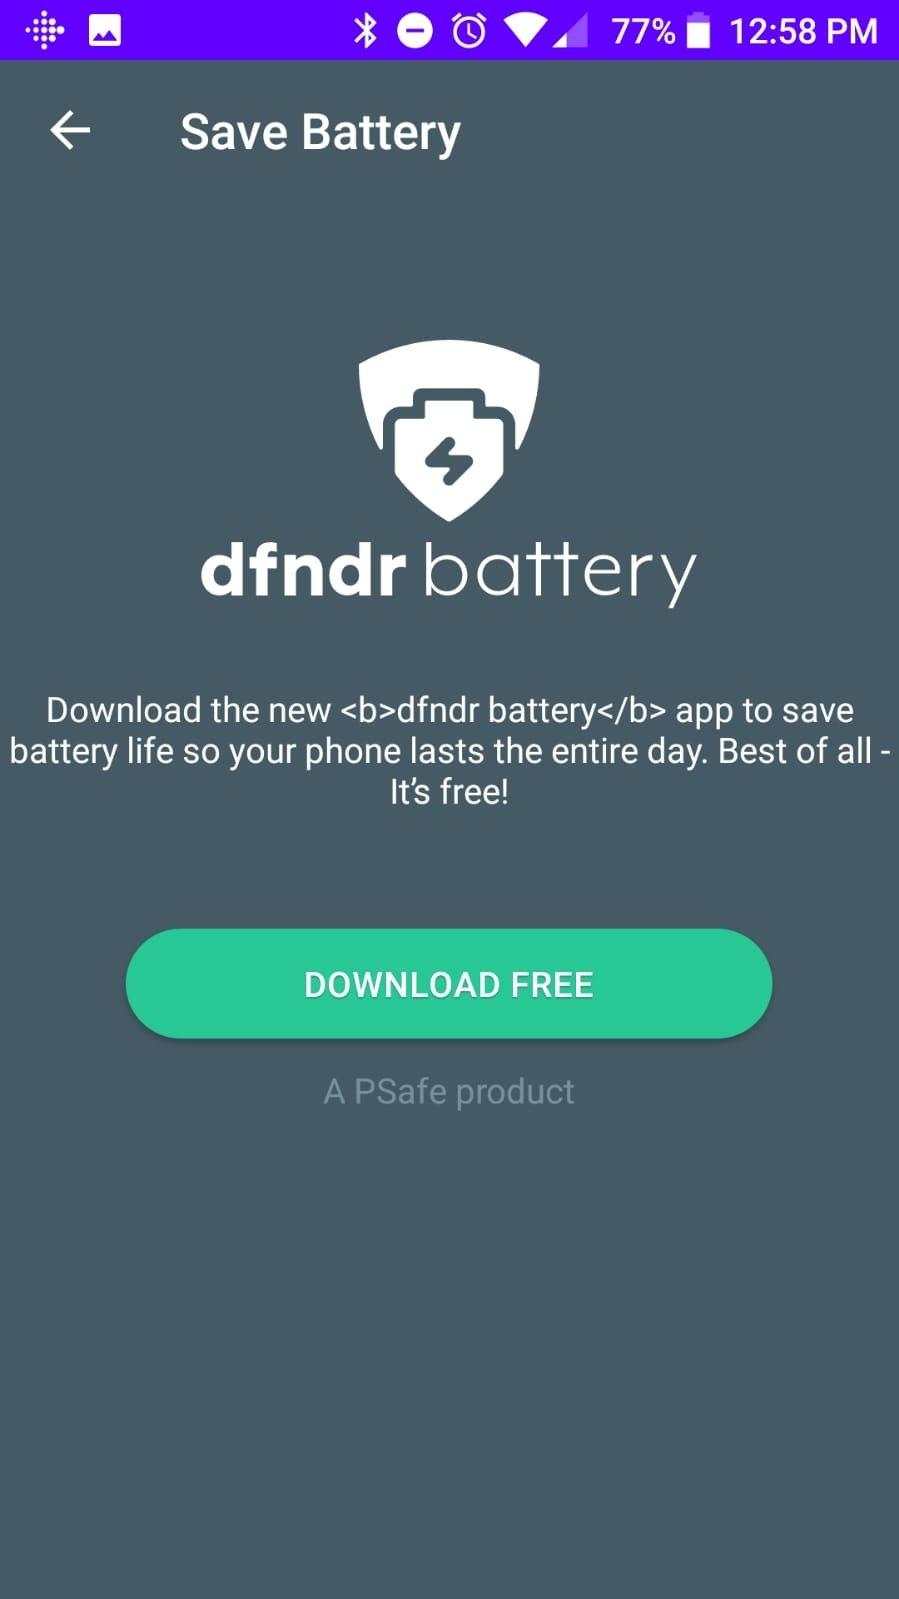 dfndr app